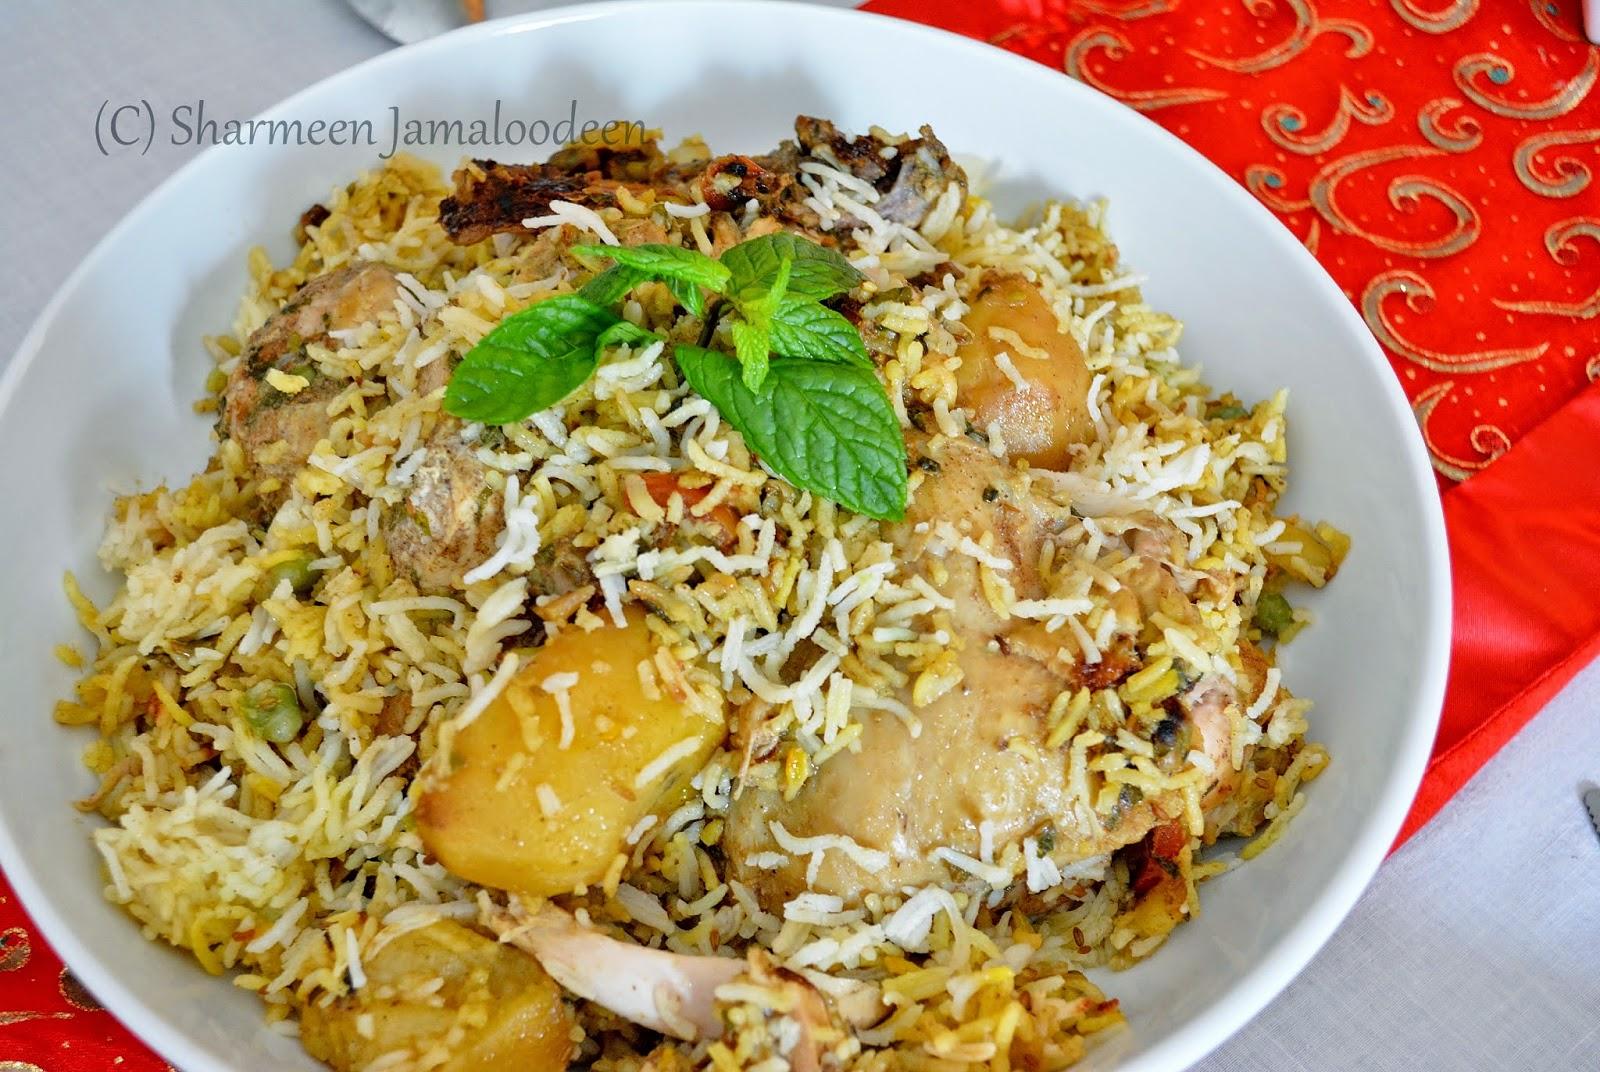 mauritian chicken biryani confessions of a foodaholic